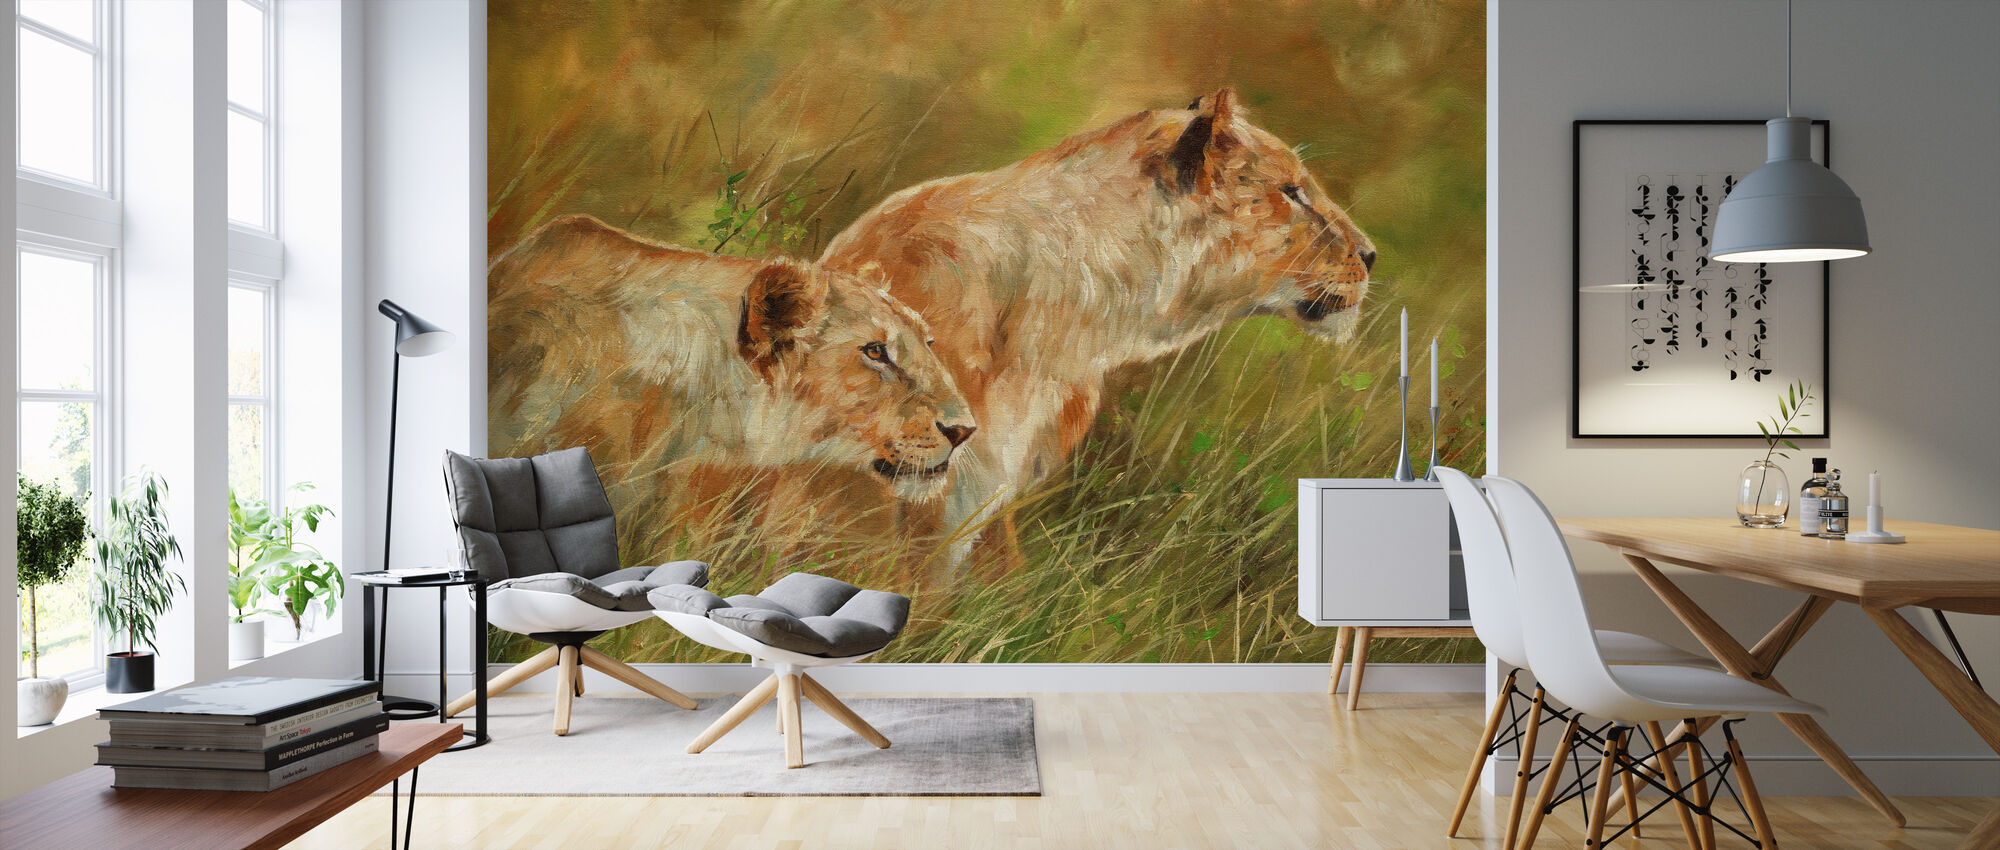 Lionesses - Wallpaper - Living Room